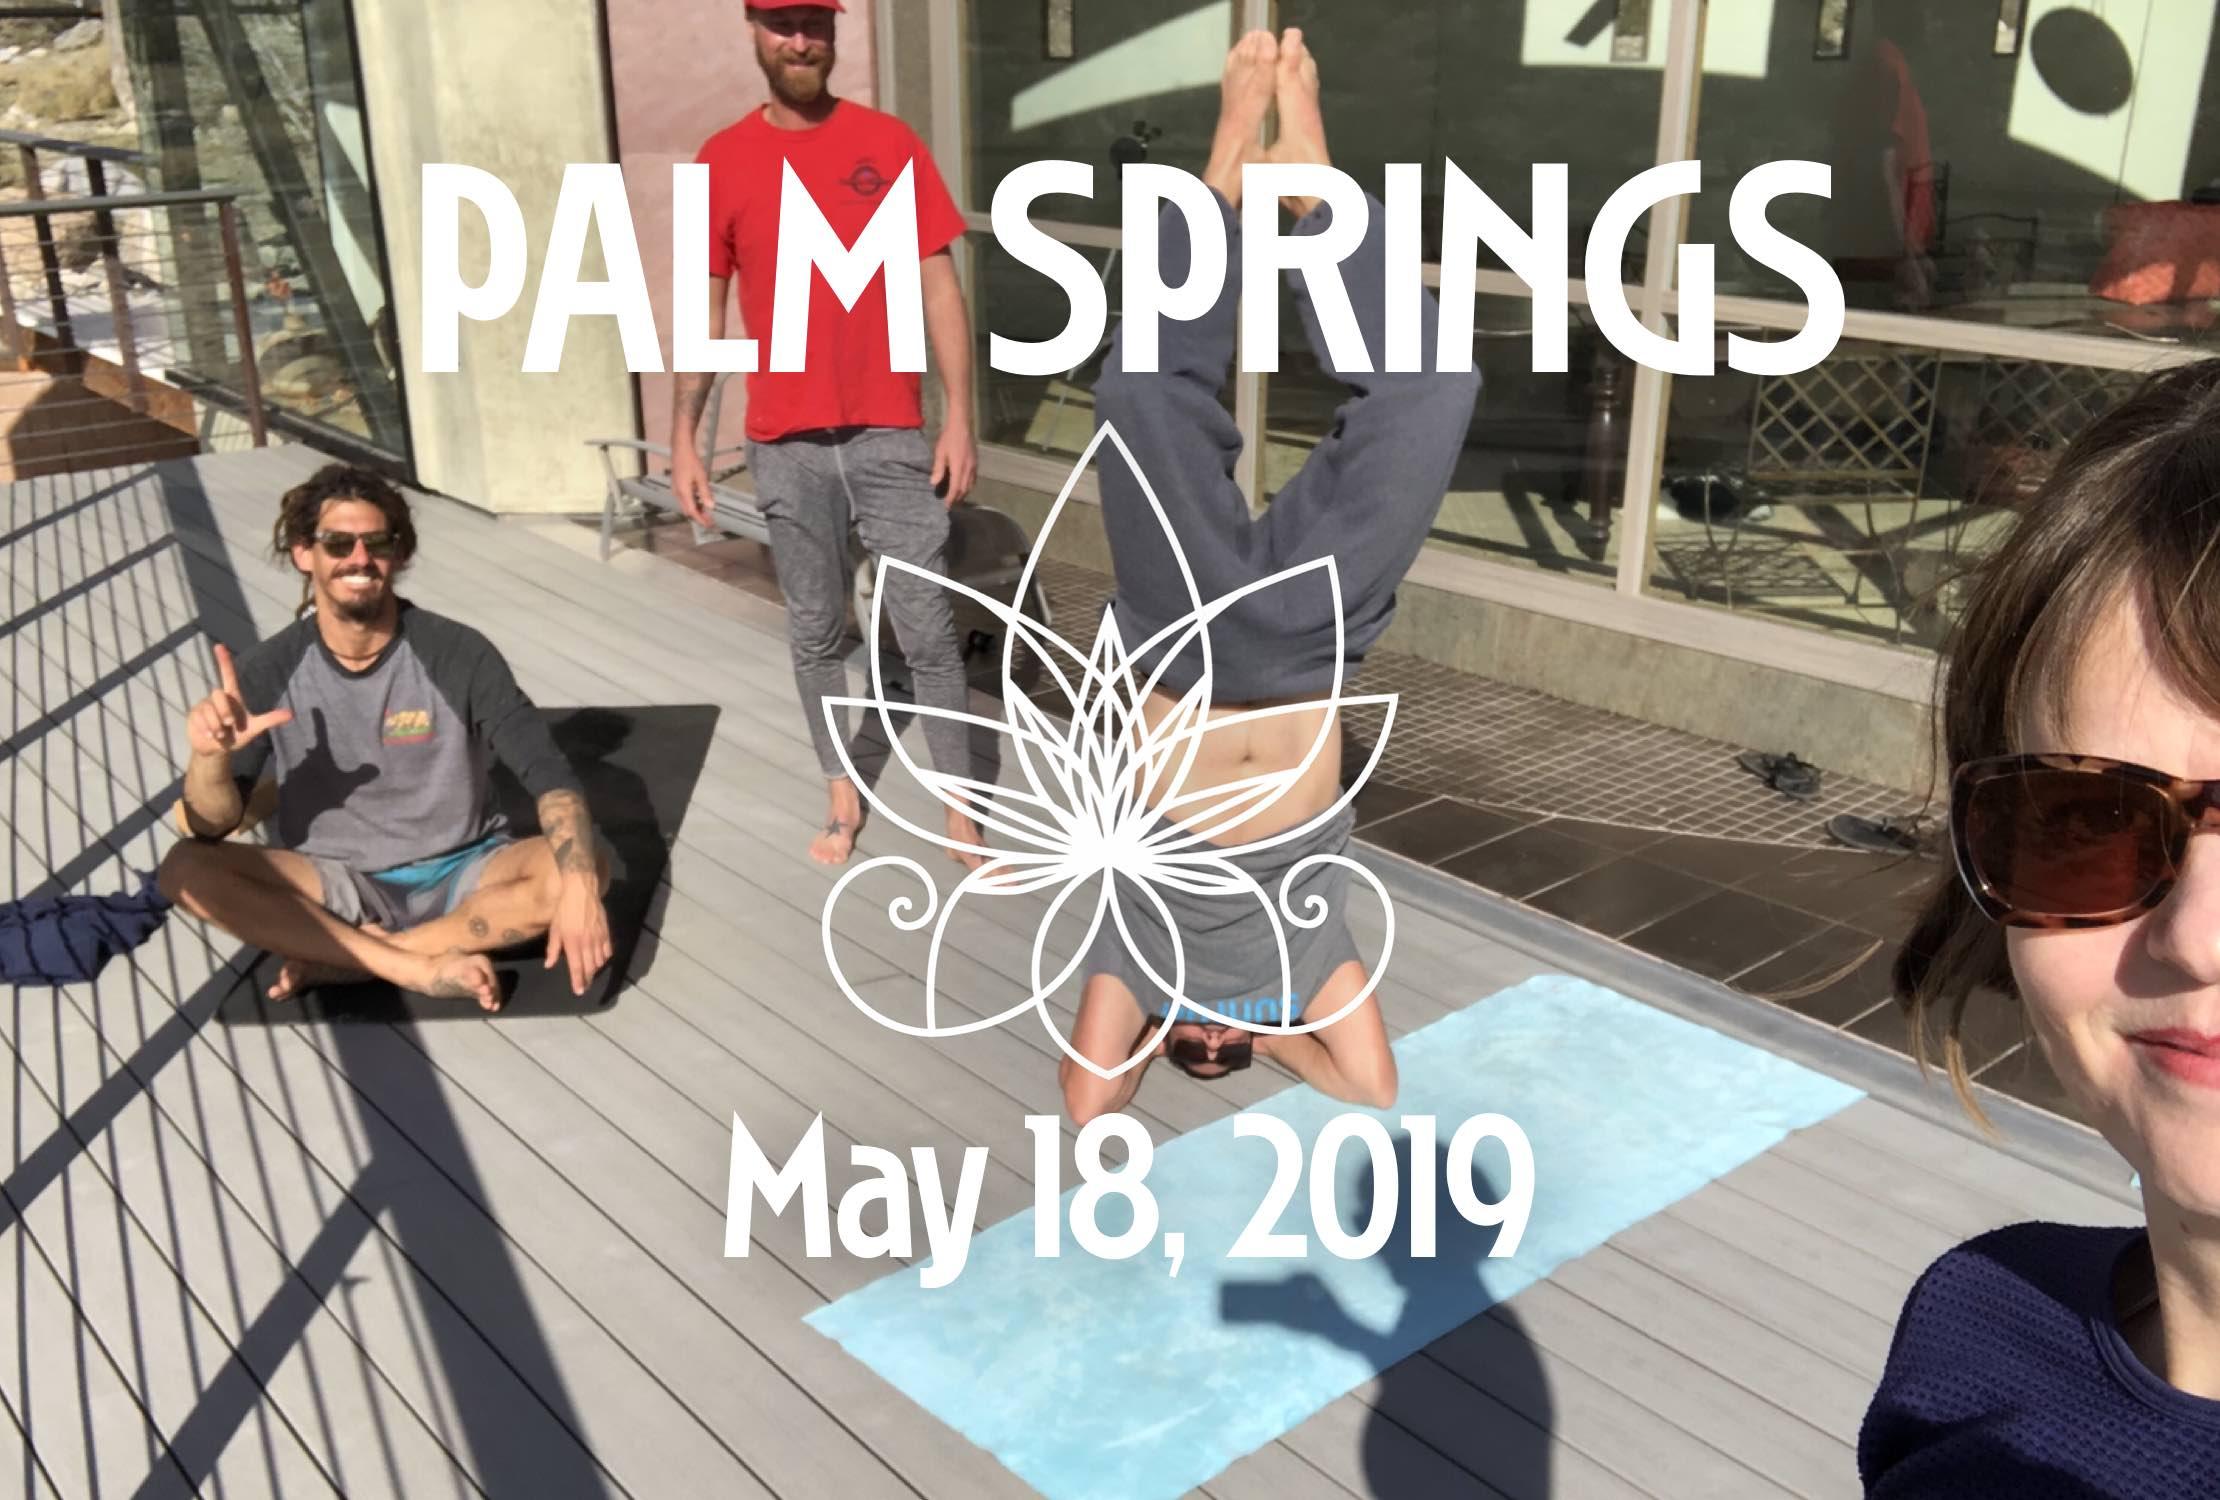 Palm Springs Facebook Event.jpg